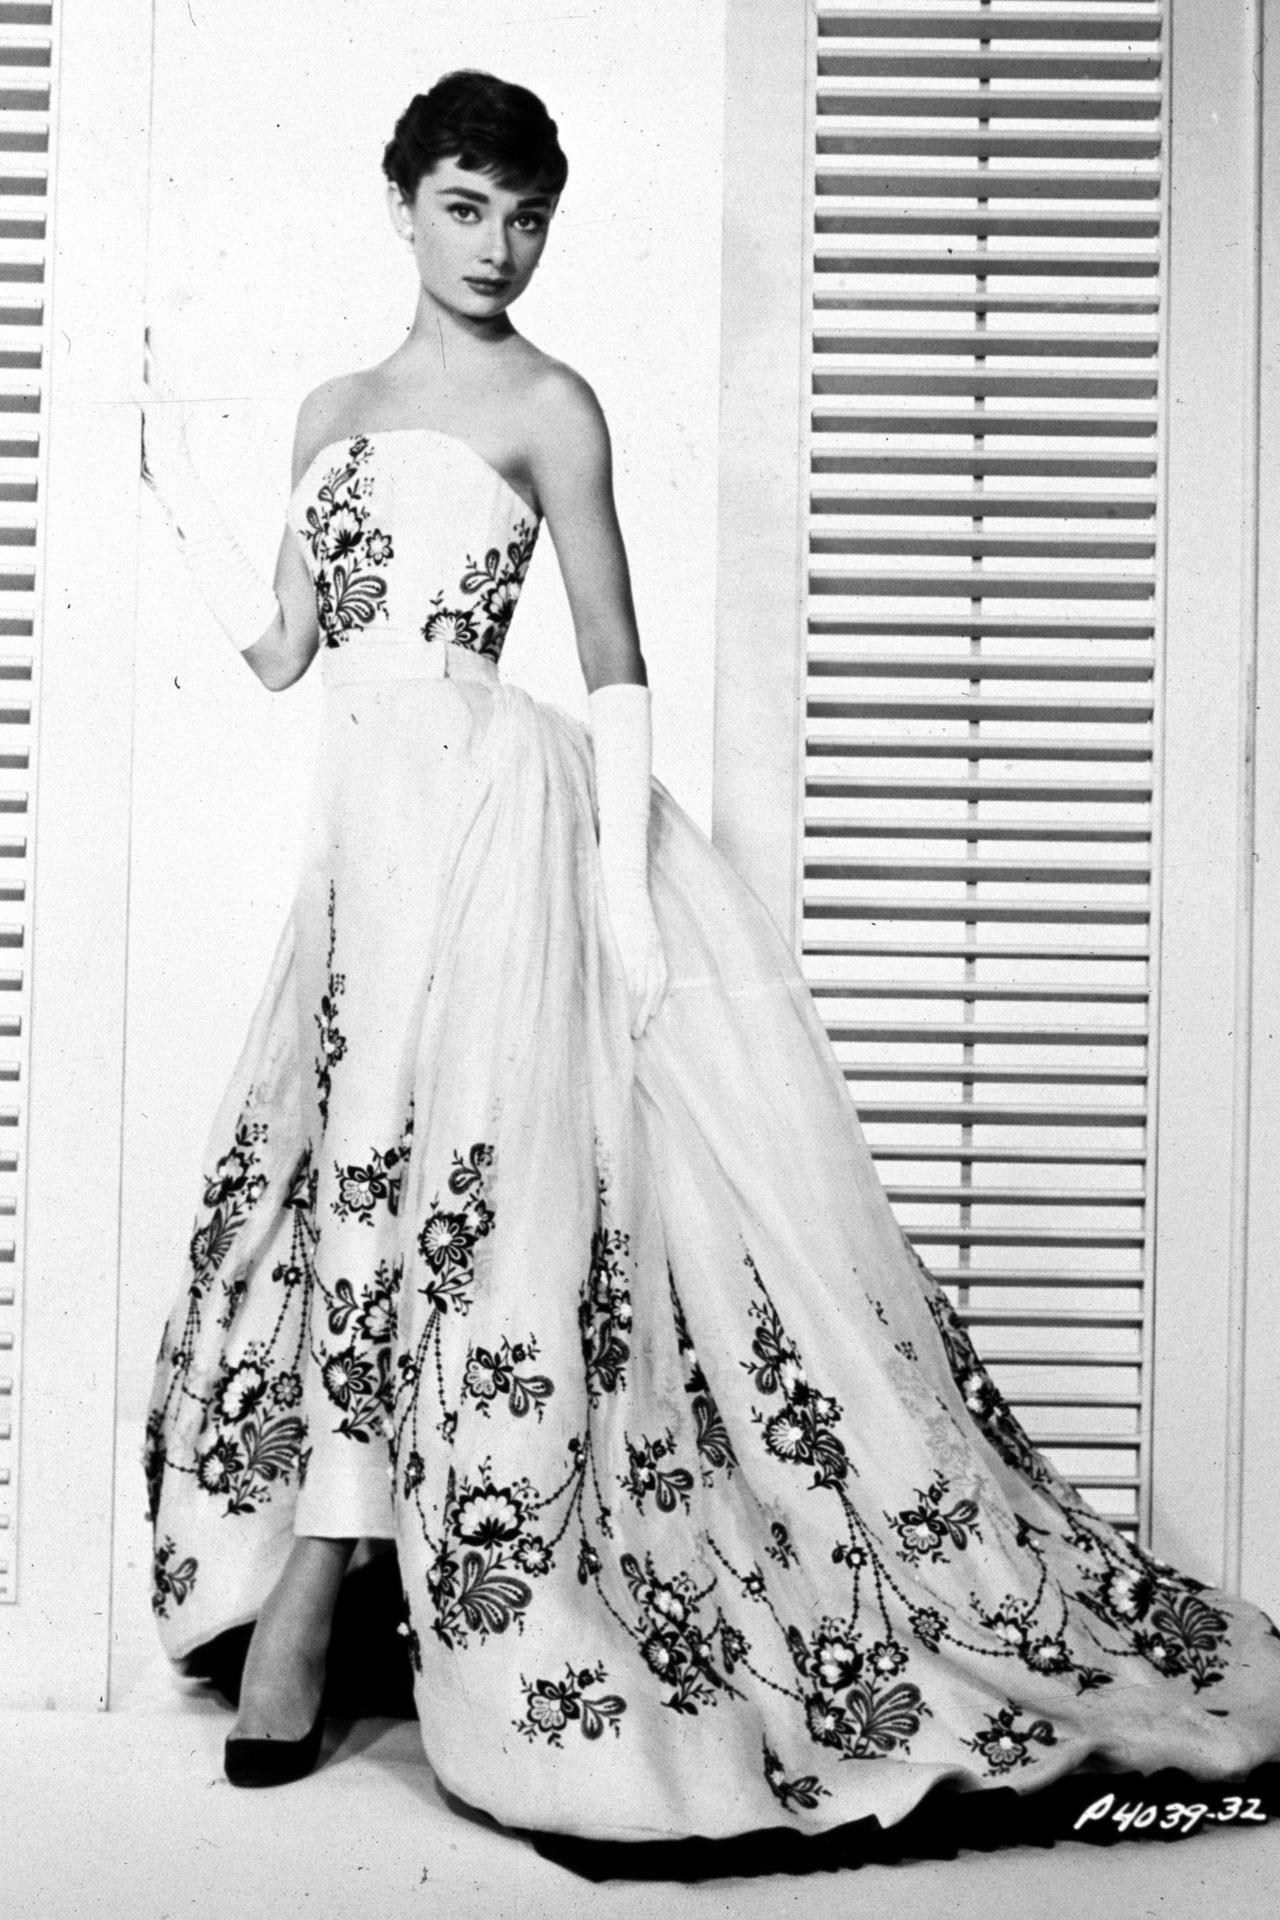 e110ffe5b1bf L abito bianco di Audrey Hepburn in Sabrina HDParamount